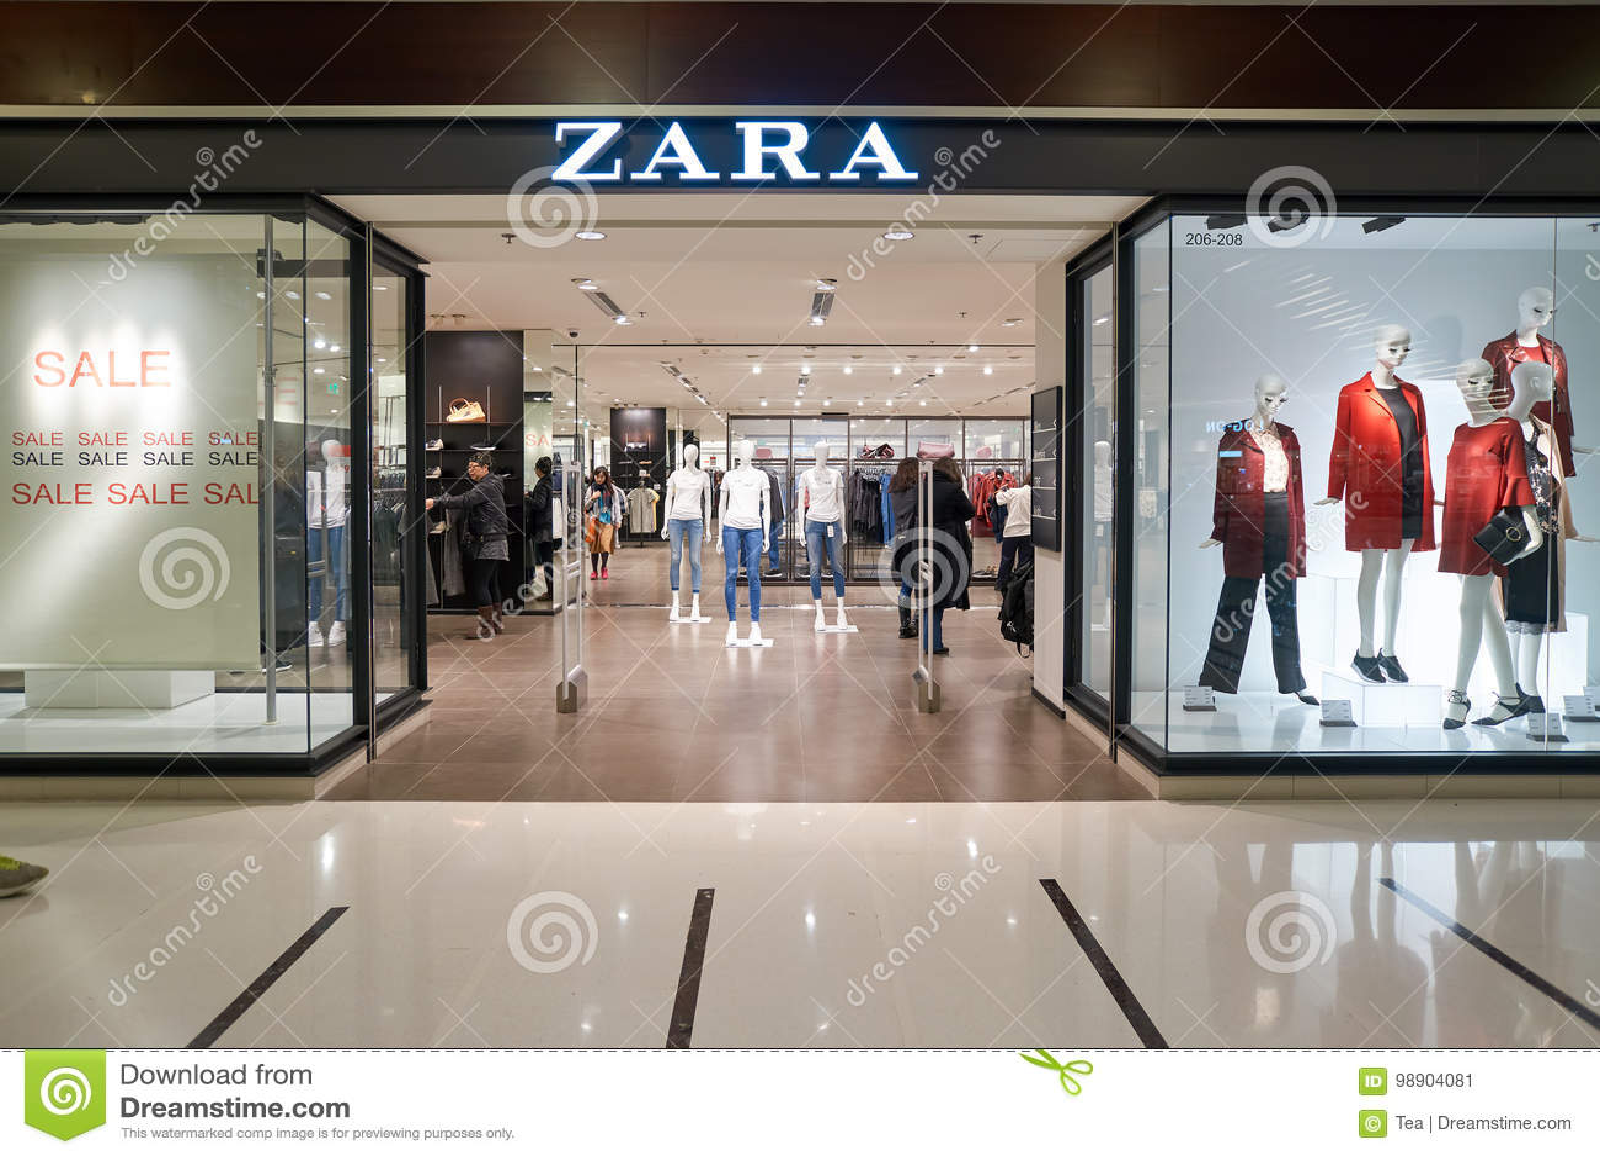 eb4853f2fc0 HONG KONG - CIRCA JANUARY, 2016: Zara store at shopping center in Hong Kong.  Zara is a Spanish clothing and accessories retailer based in Arteixo,  Galicia.